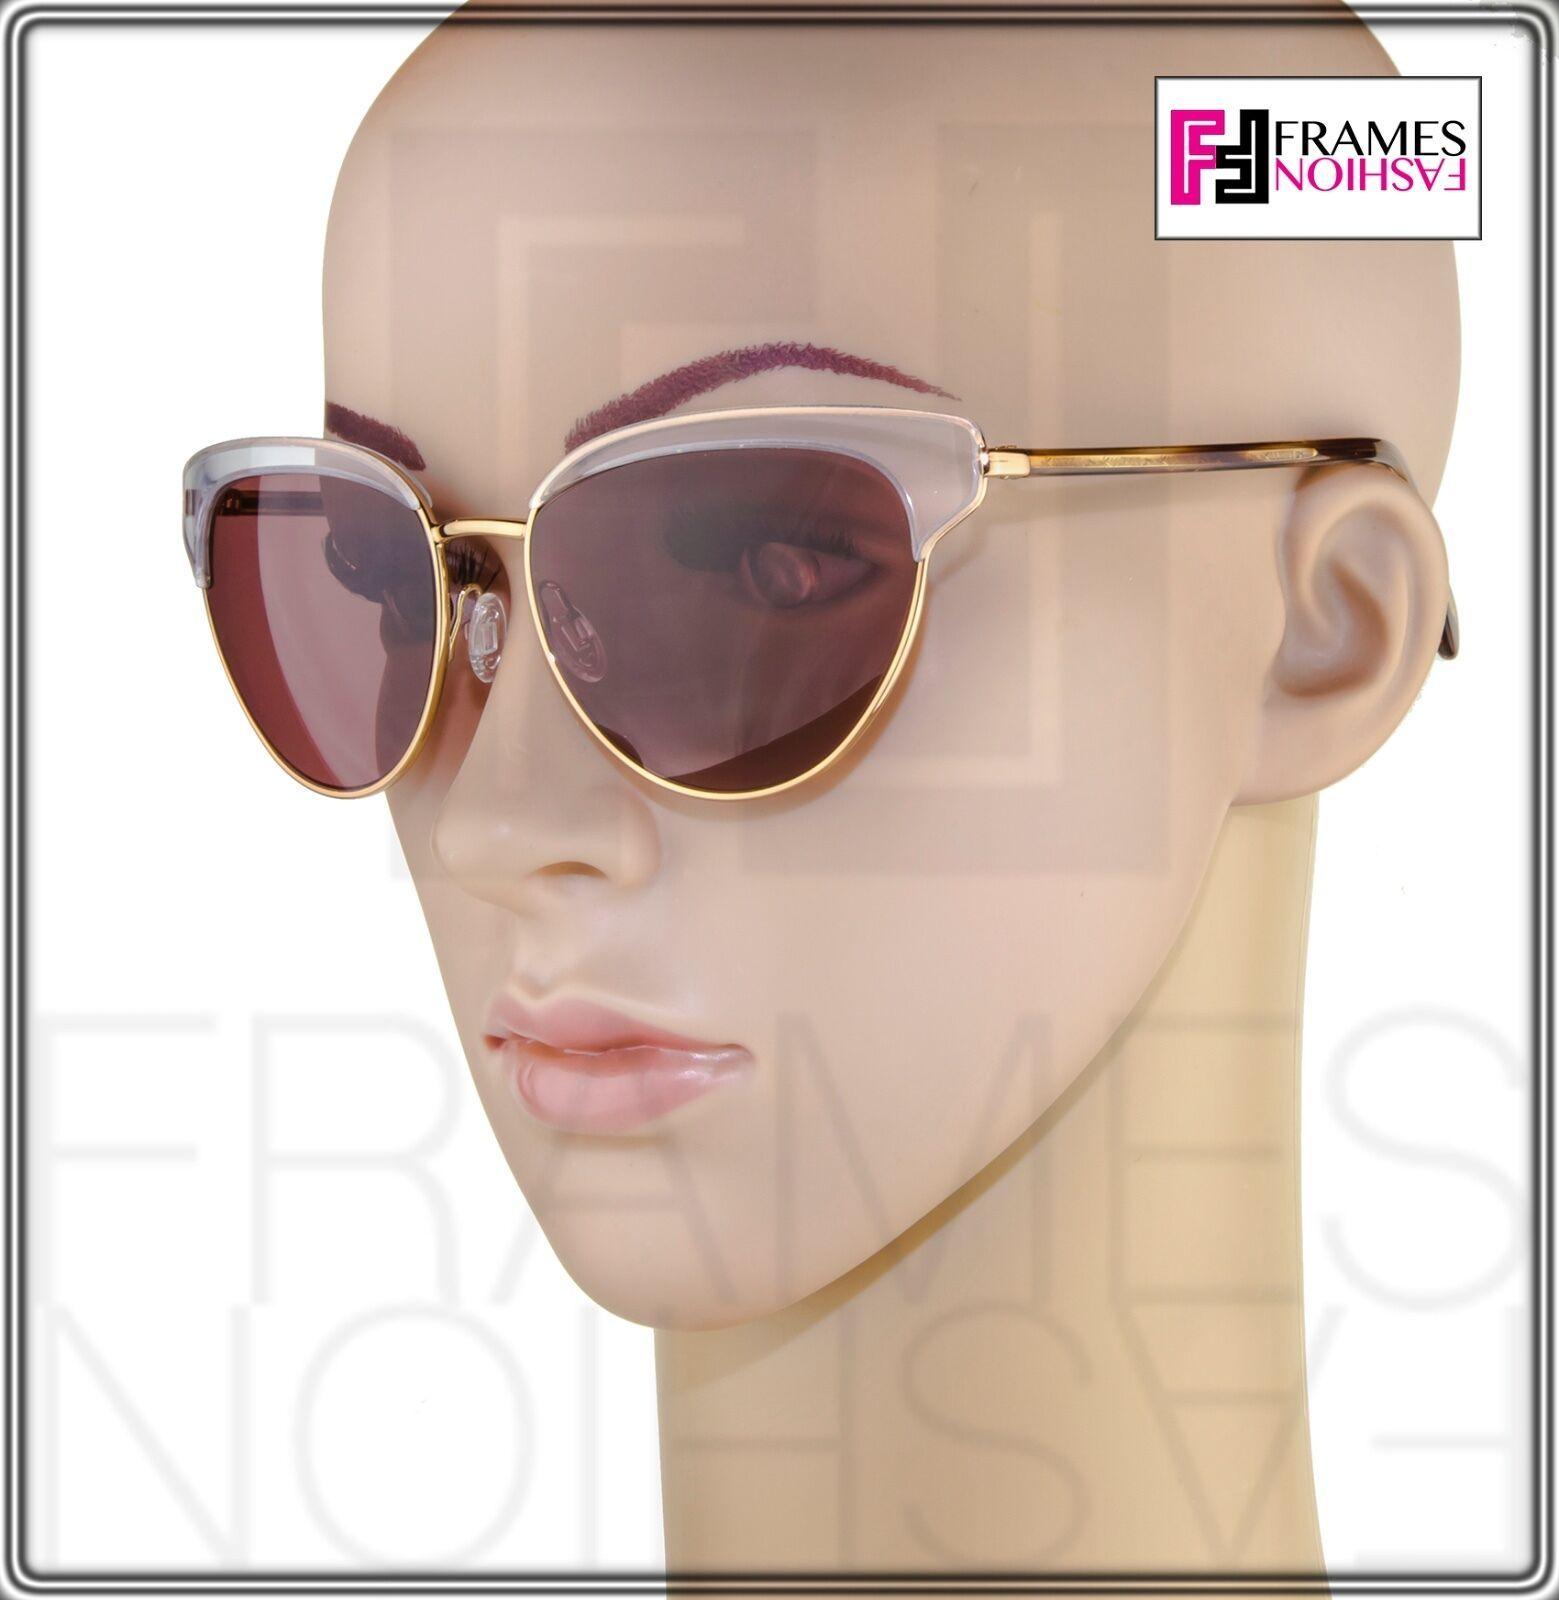 OLIVER PEOPLES JOSA OV1187S Rose Gold Pink Crystal Cat Eye Sunglasses 1187 image 2